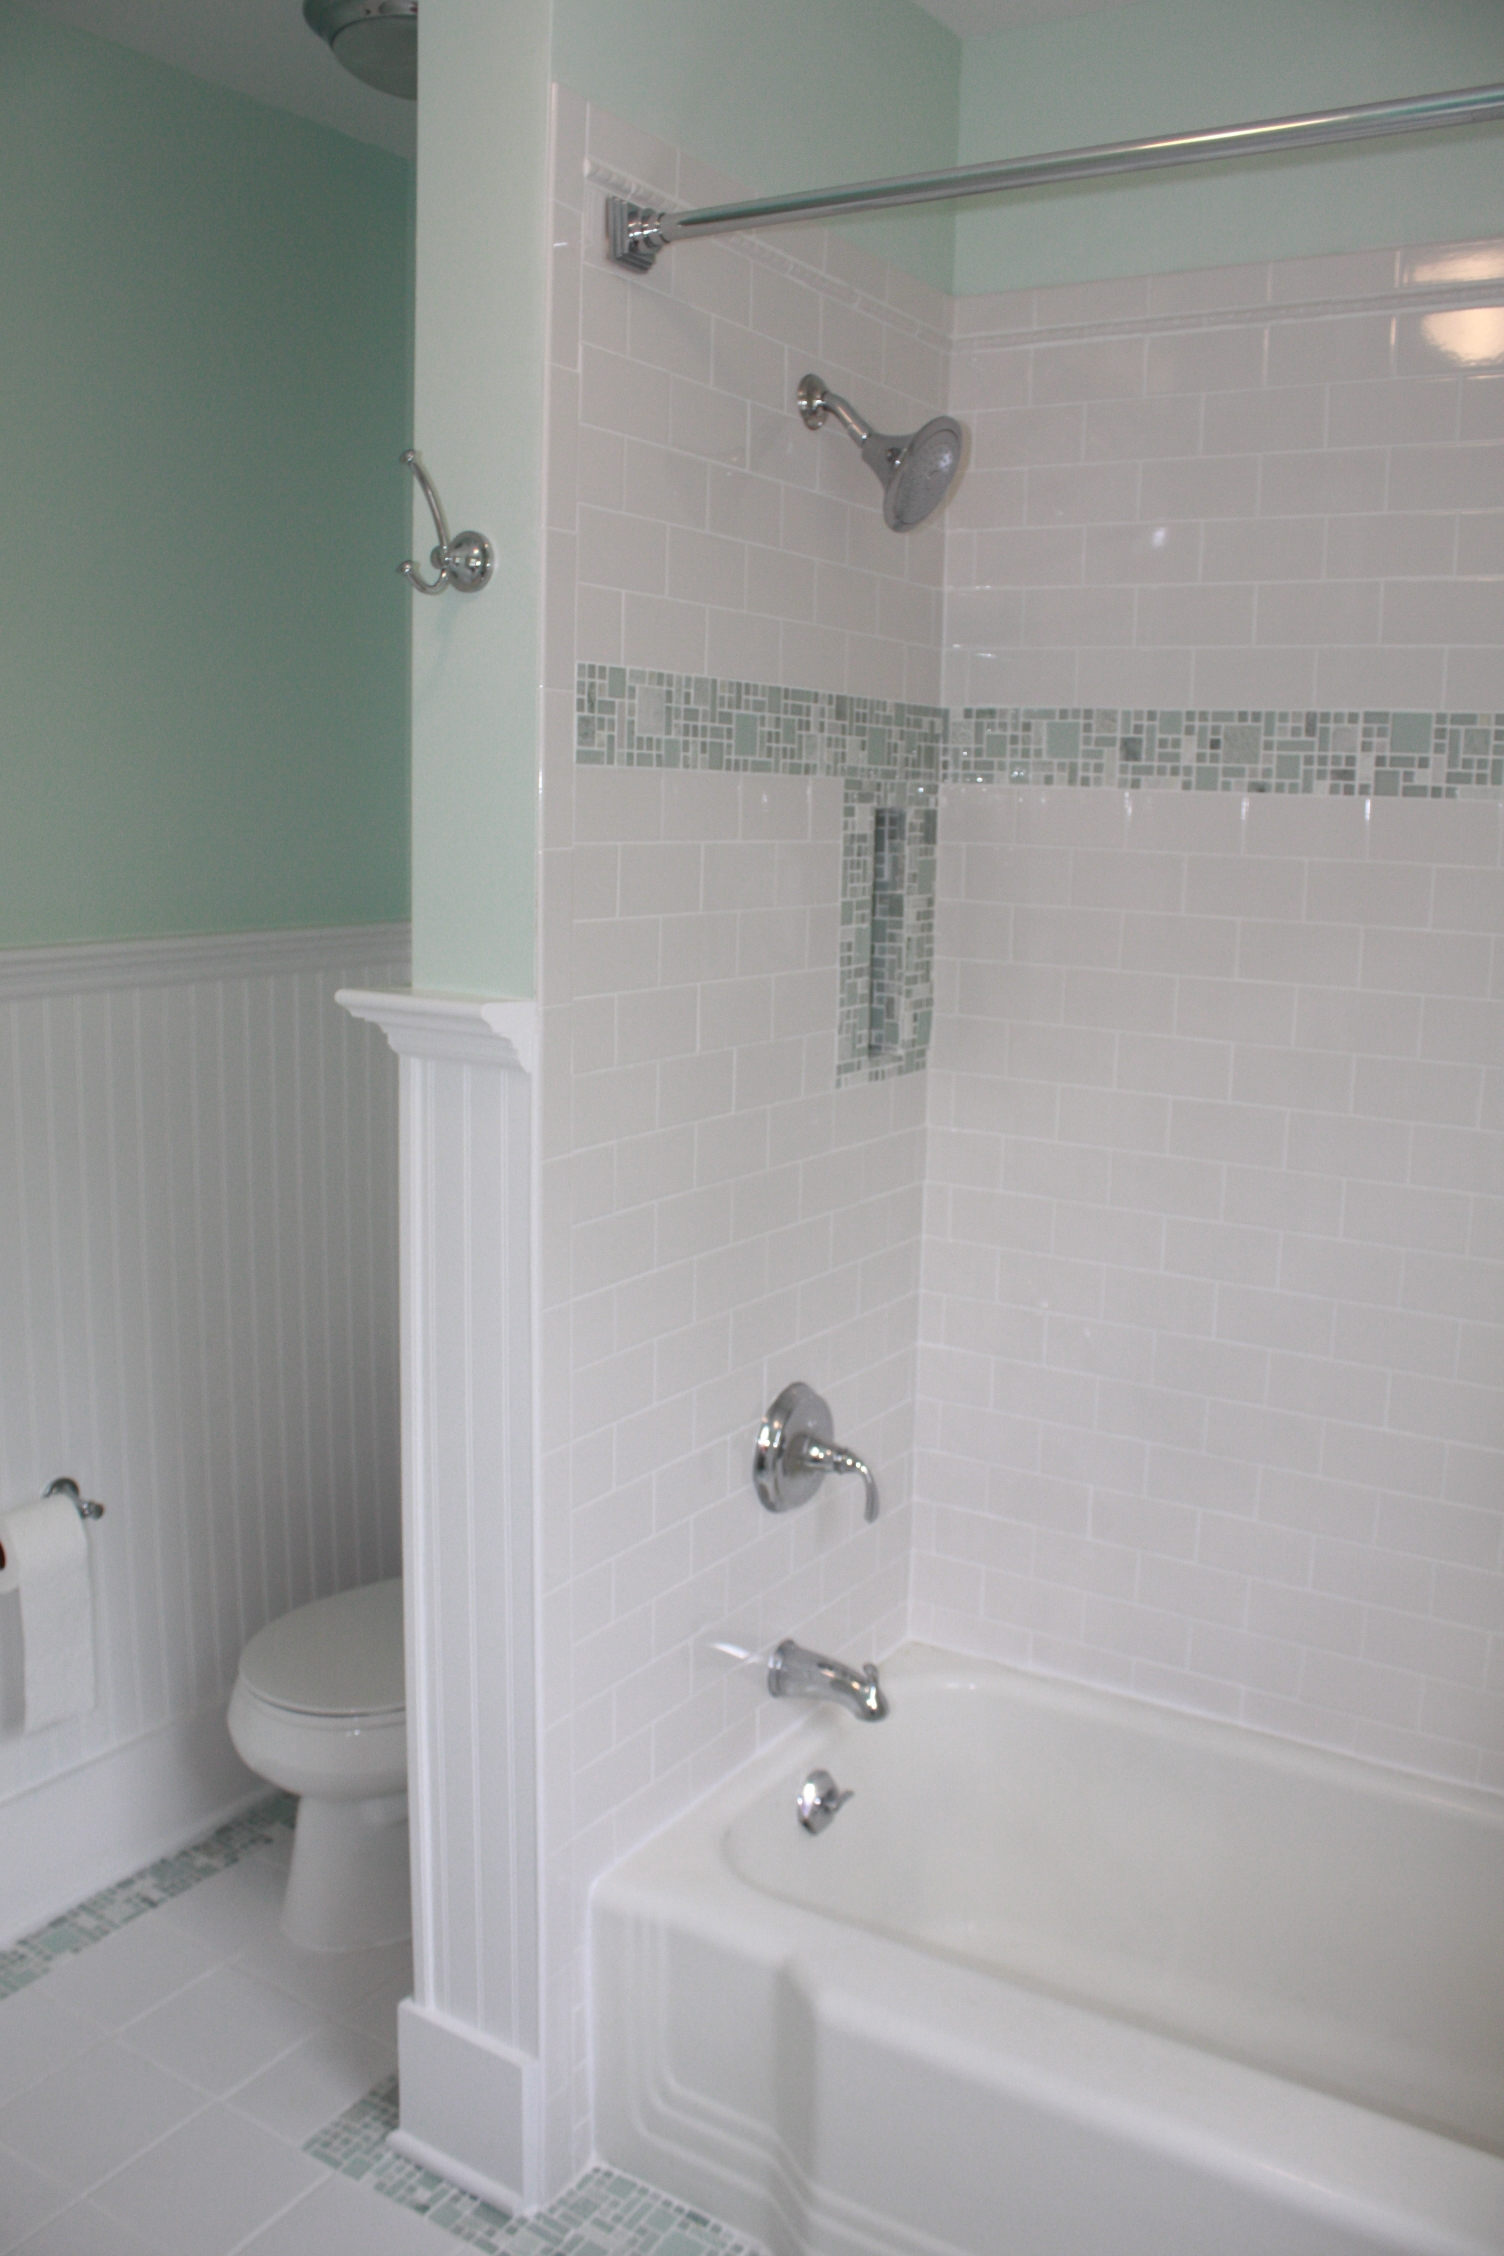 cvisions_bathroom_remodel9.JPG